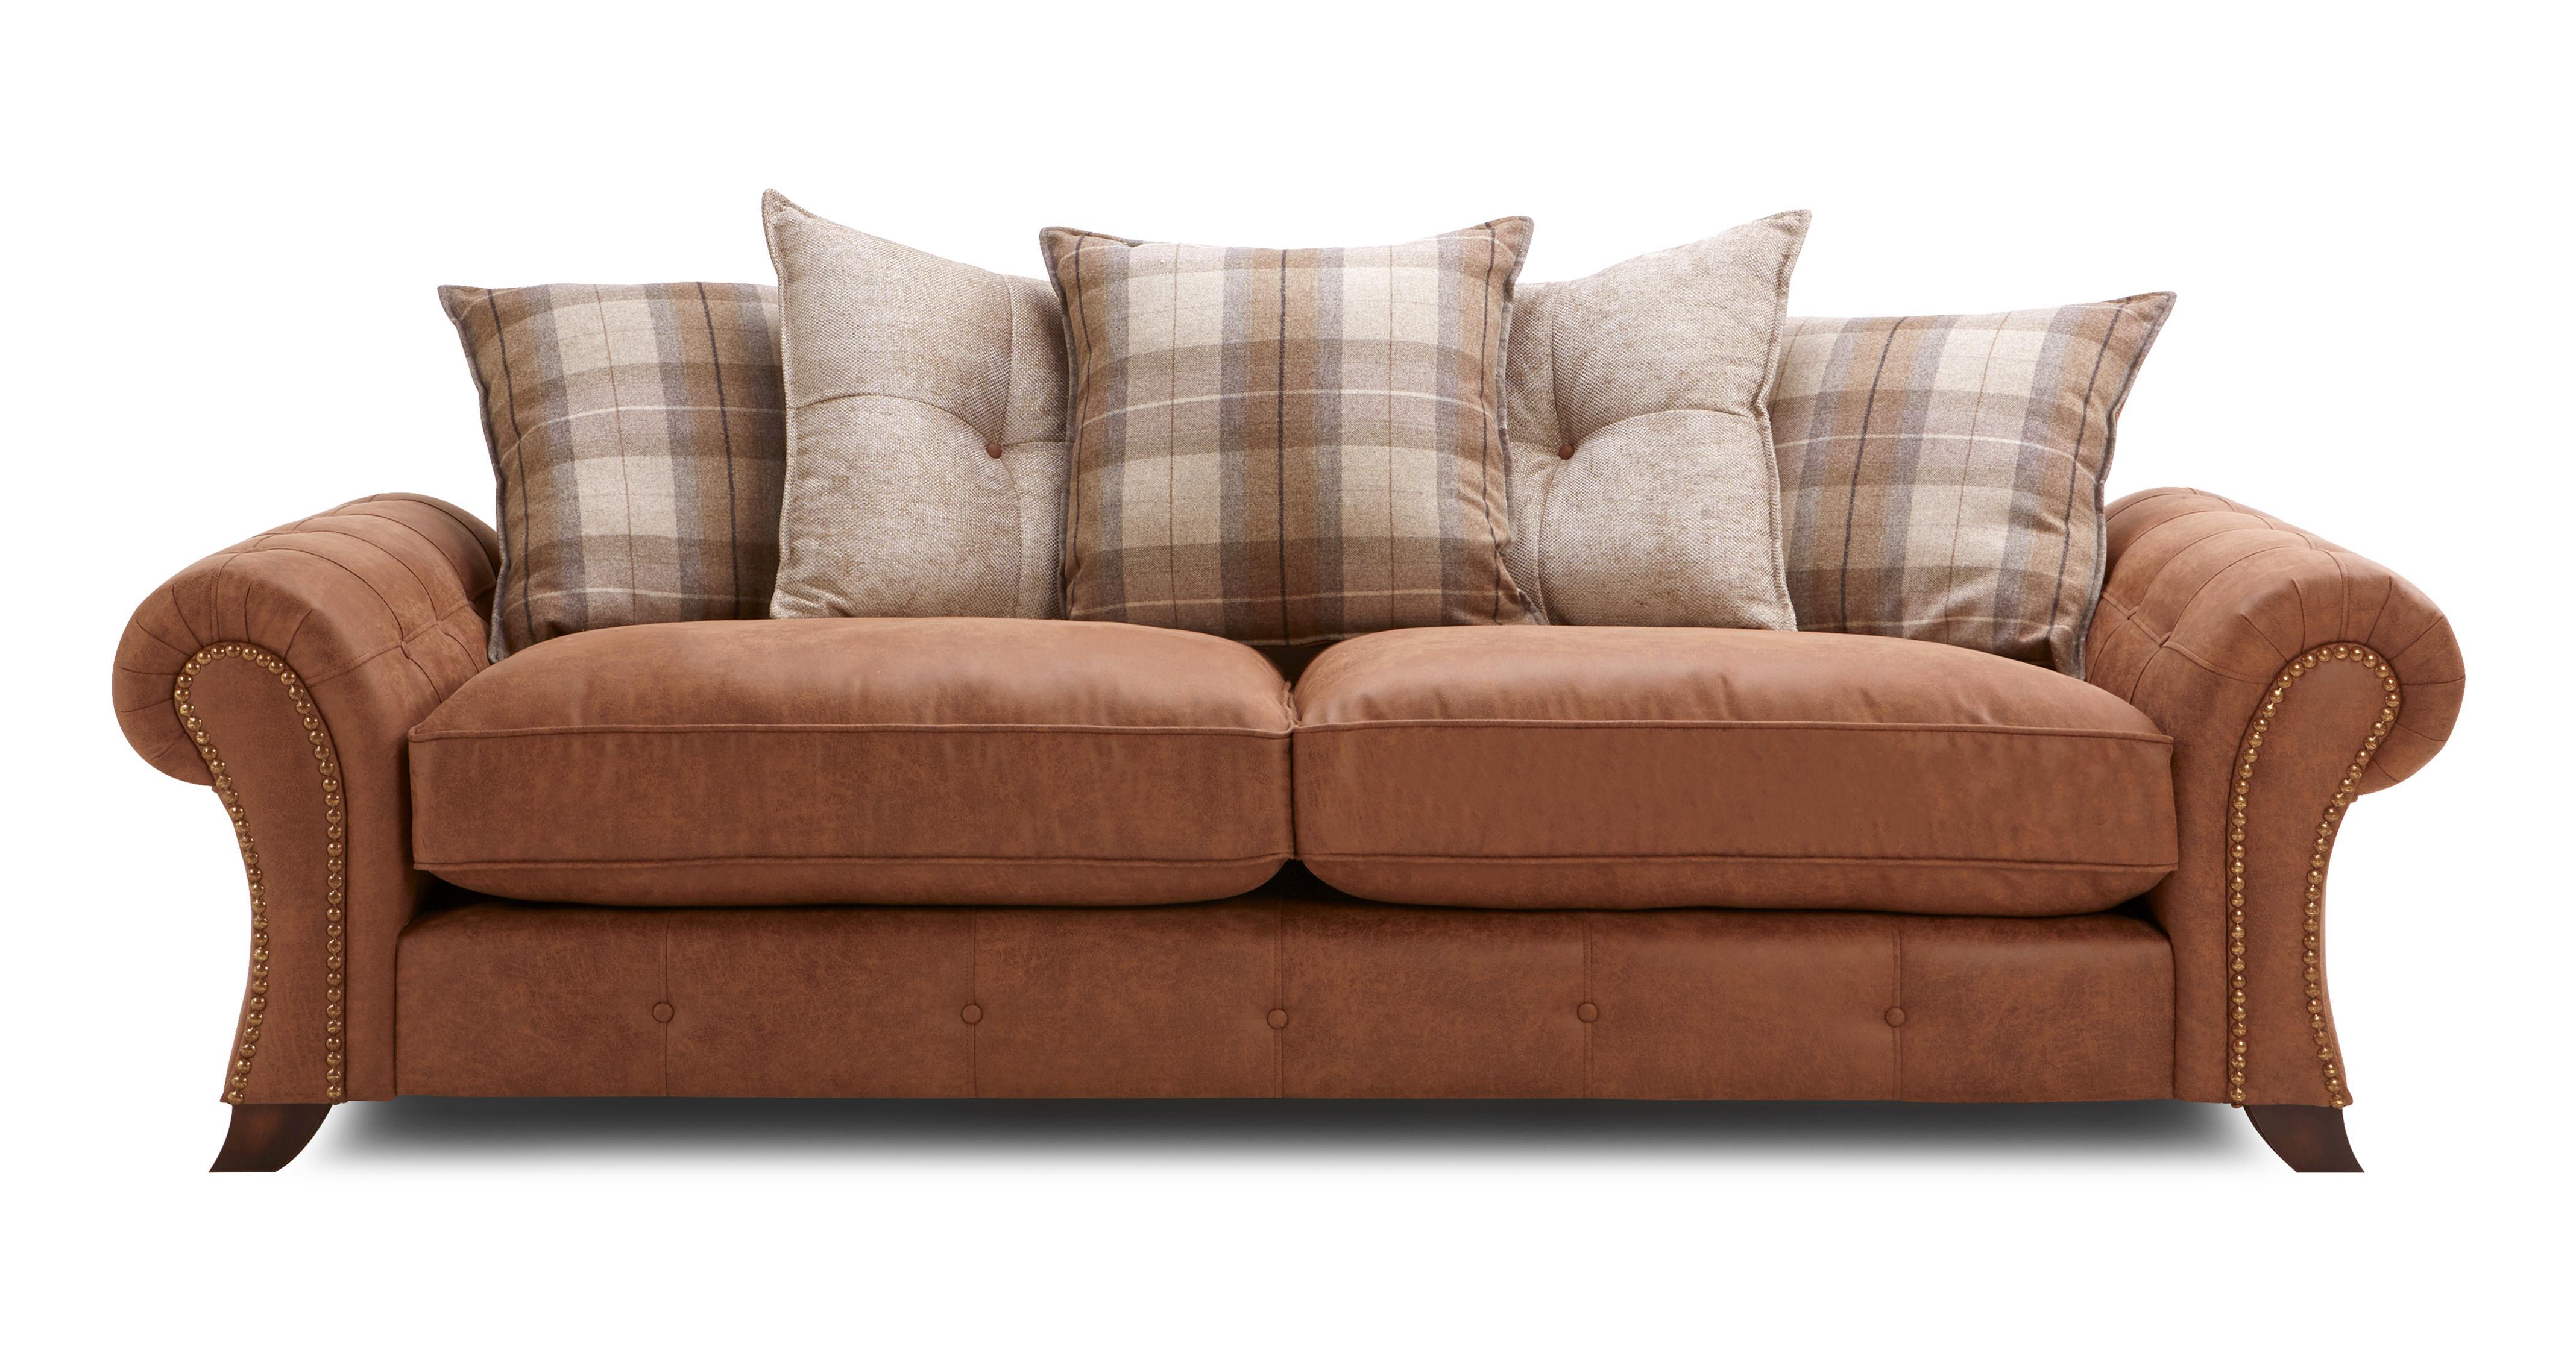 Delightful Cedar 4 Seater Pillow Back Sofa Oakland | DFS